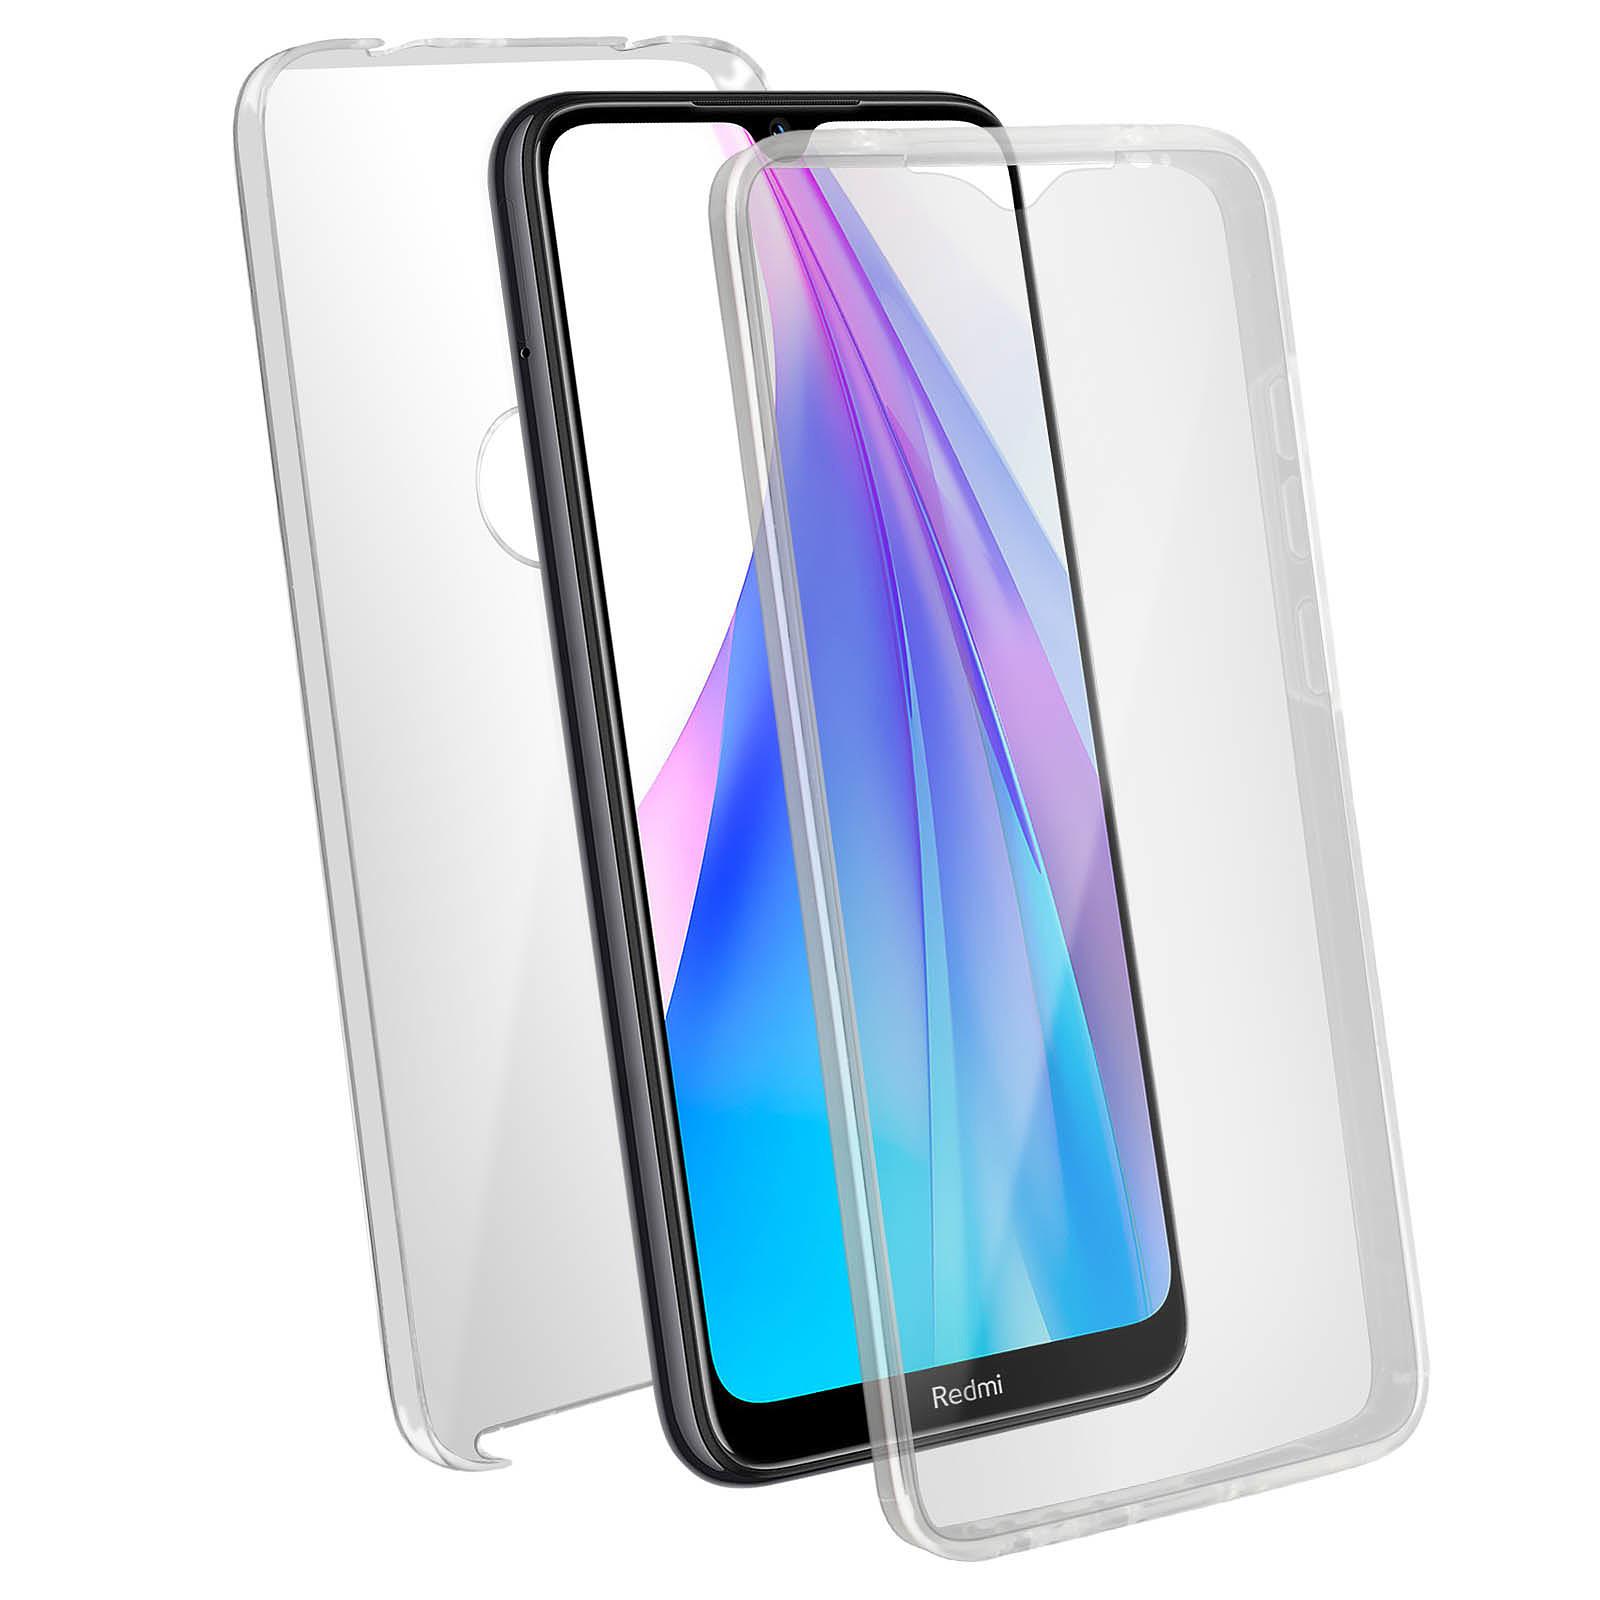 Avizar Coque Transparent pour Xiaomi Redmi Note 8T , Xiaomi Redmi Note 8